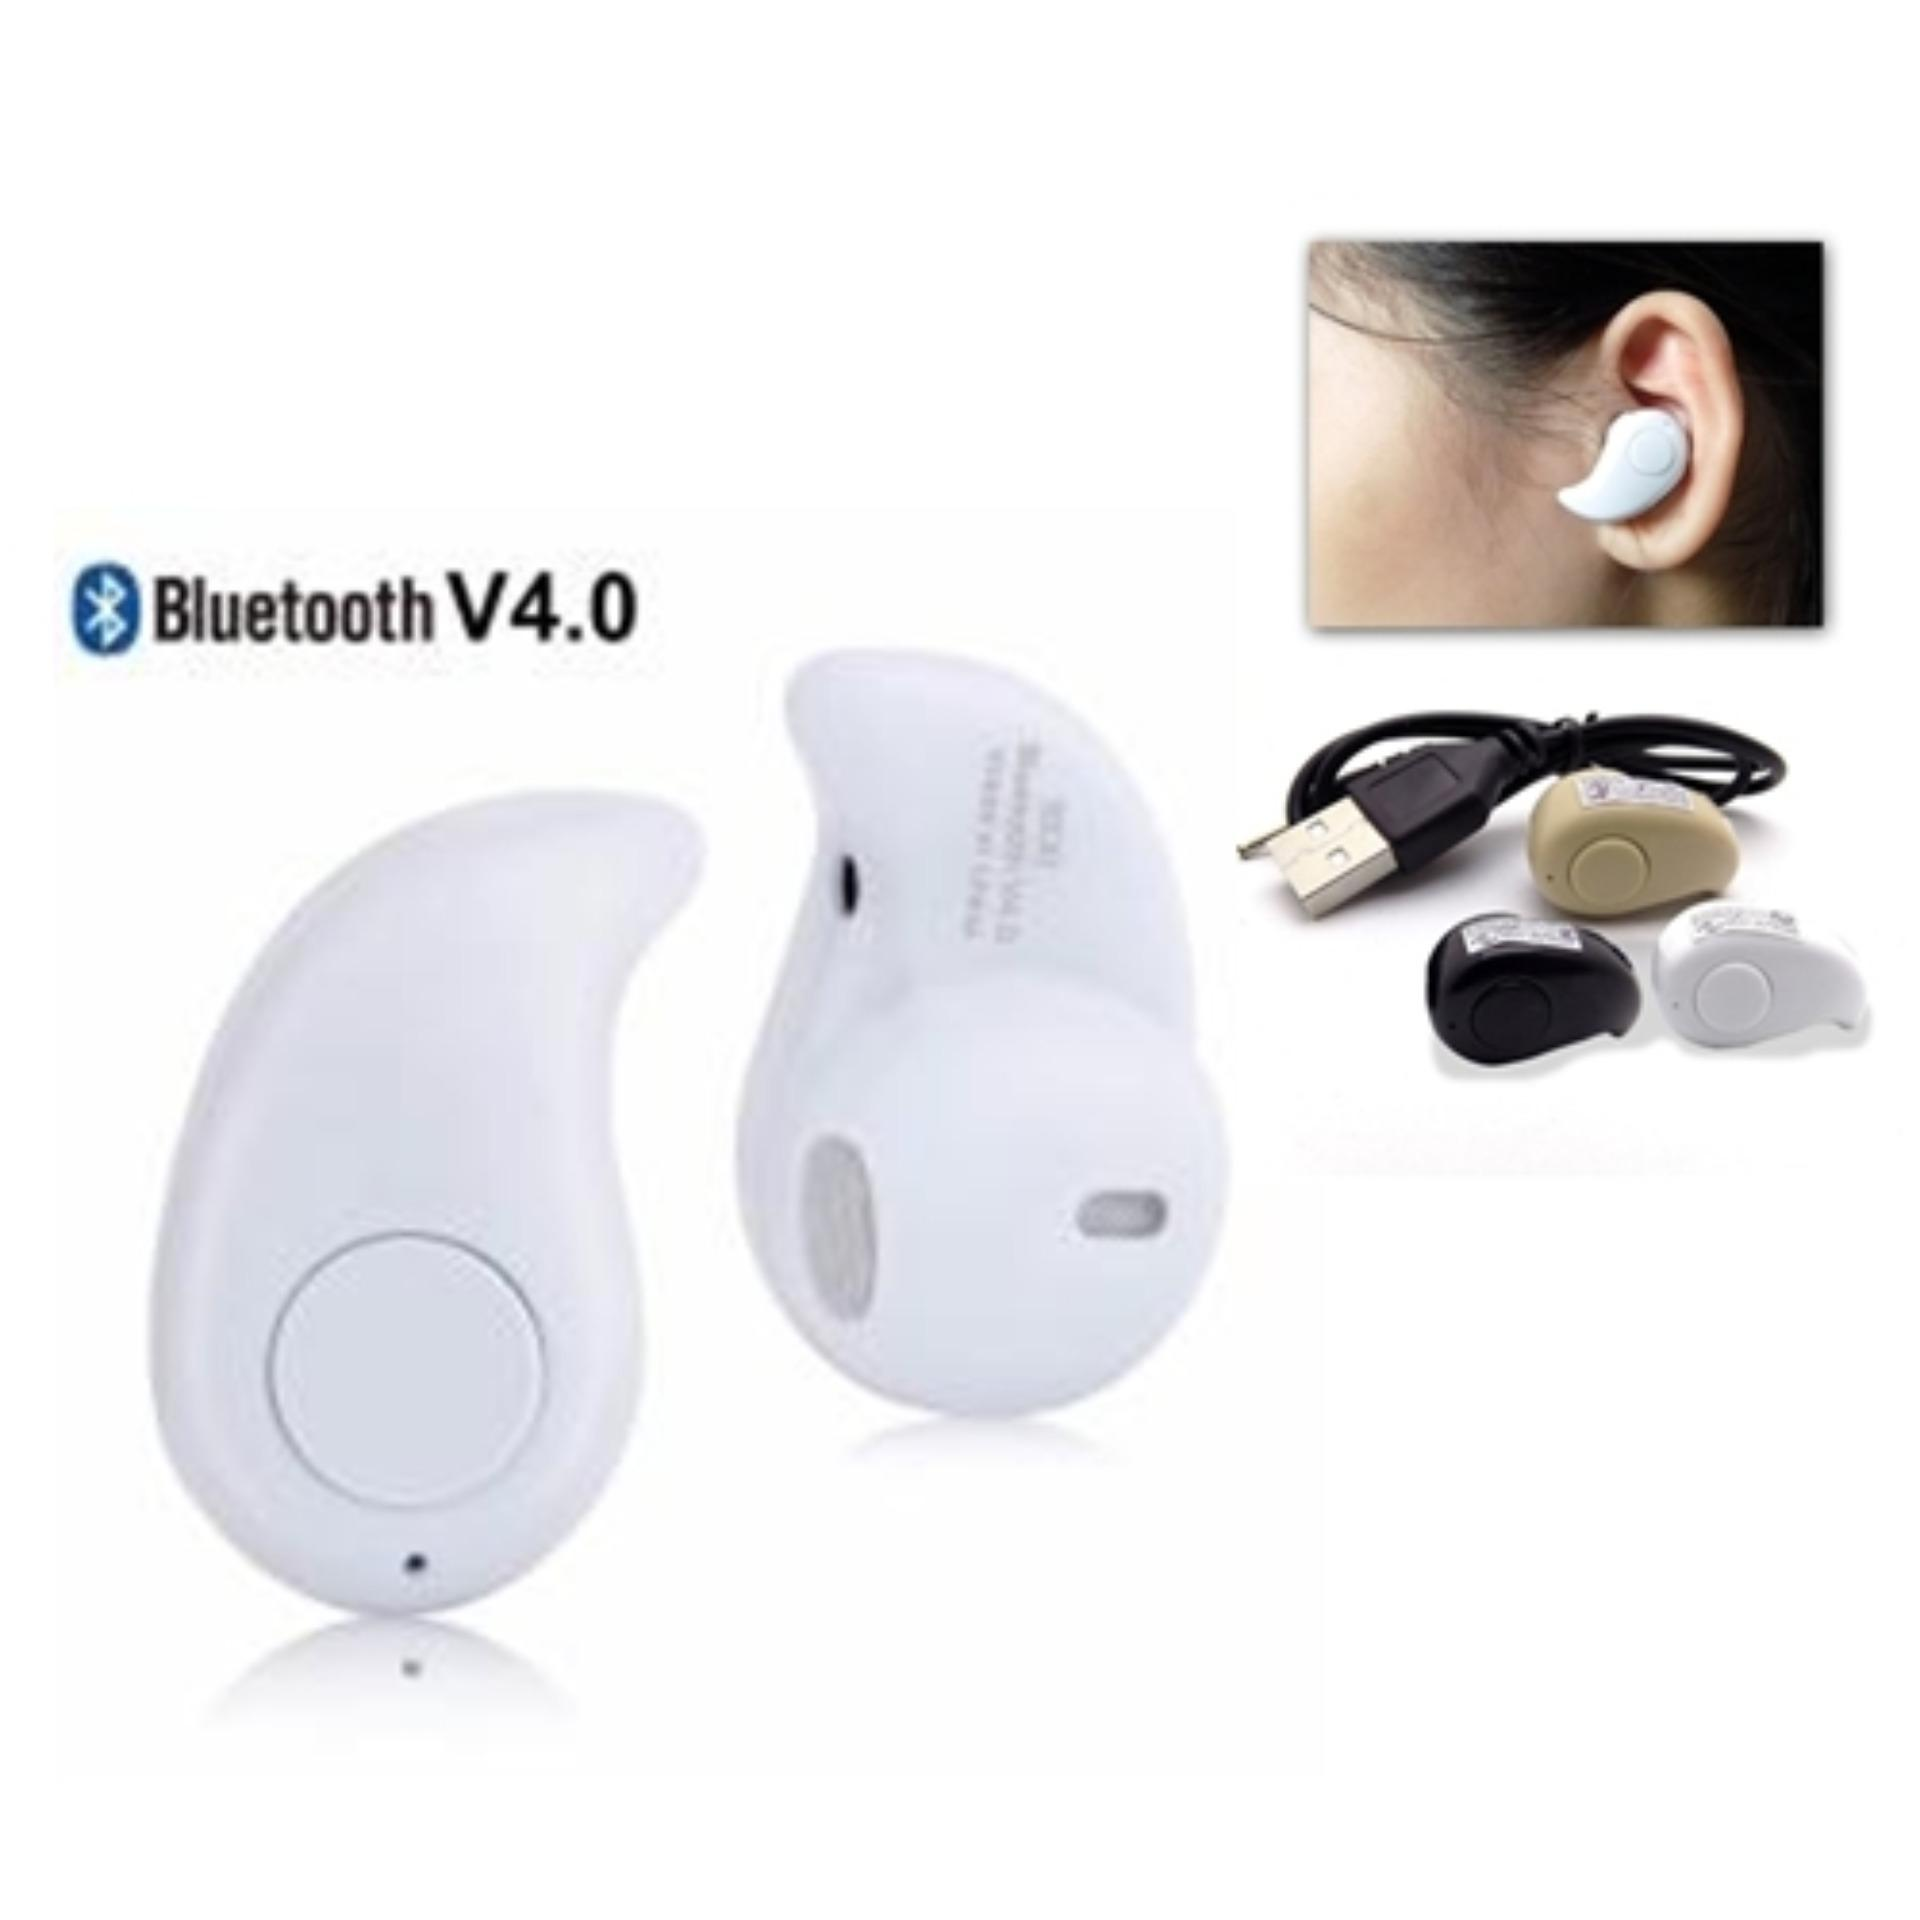 SAMSUNG Hansfree wireeles (Kokocip)  Mini S530 4.1 Stereo Bluetooth Earbuds